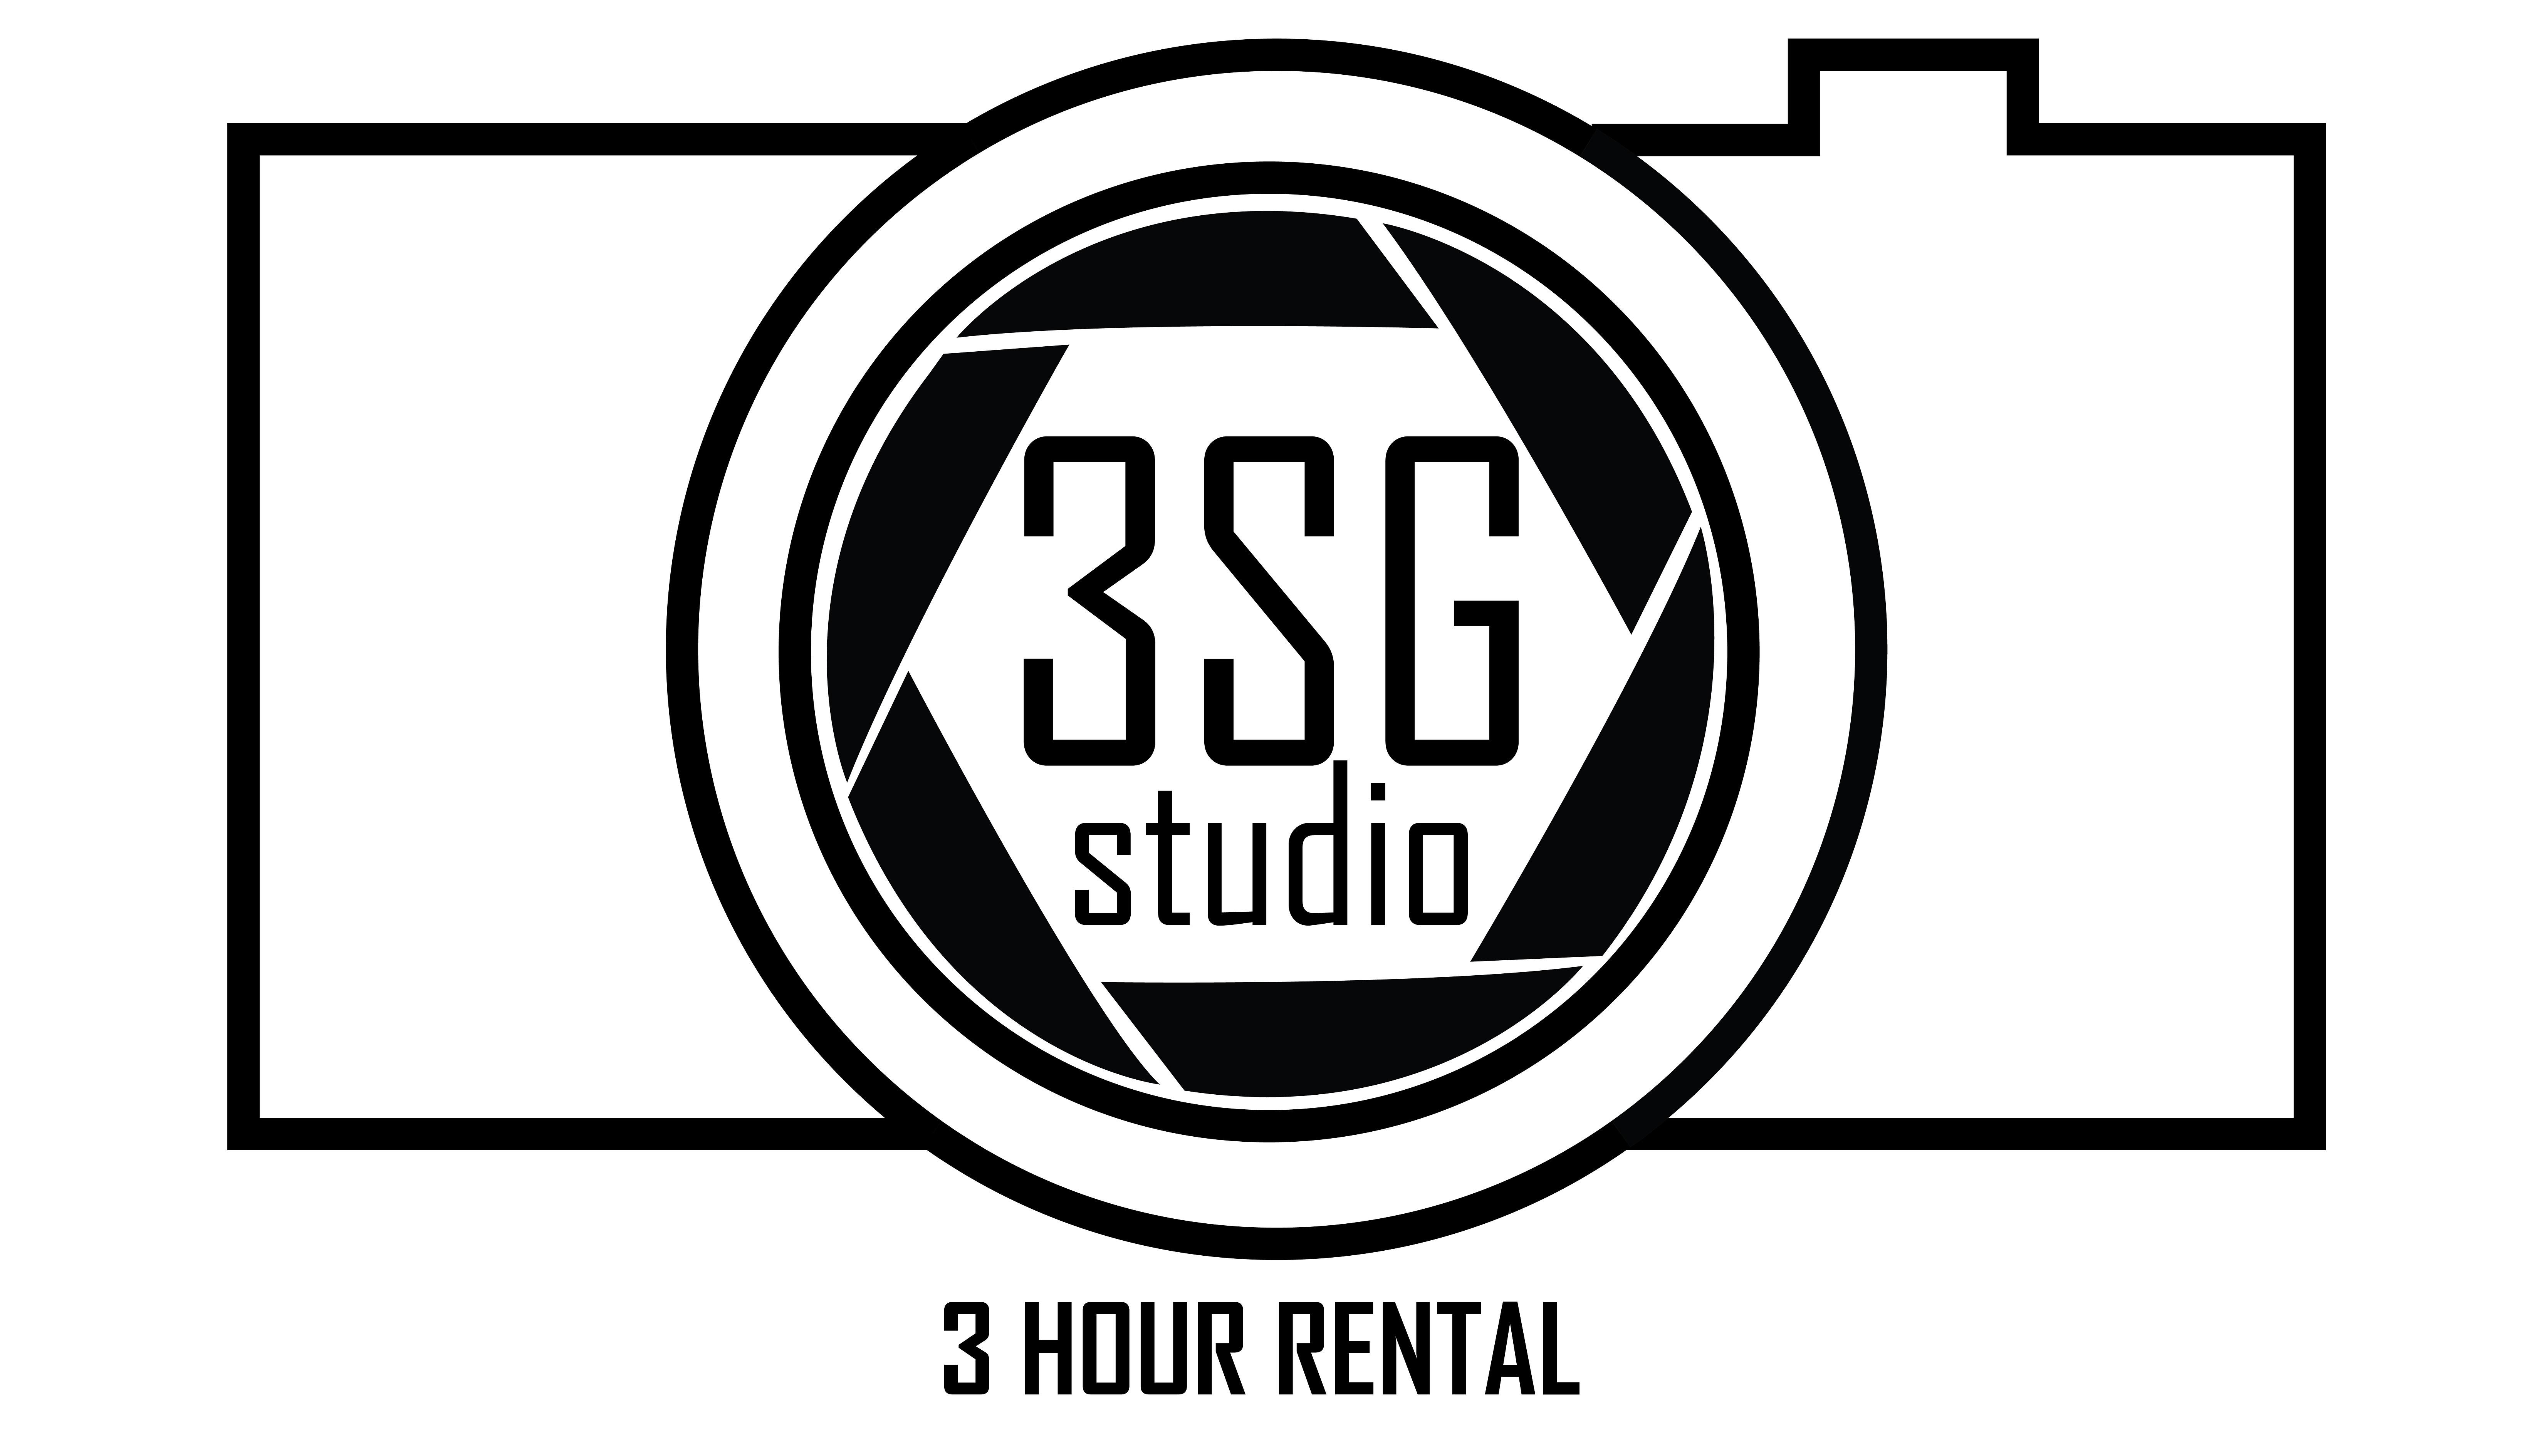 3 Hour Rental